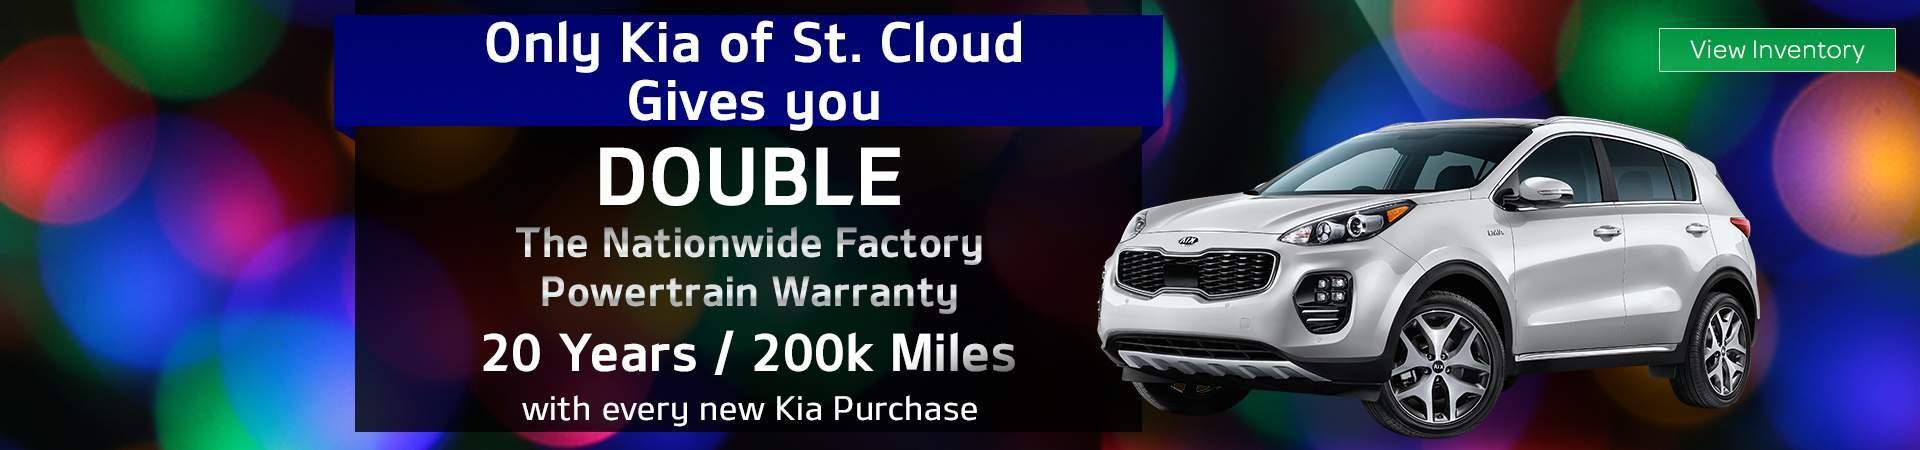 in region cars value brooklyn s dealers used mn east lupient dealer disclaimer kia sedona park america best